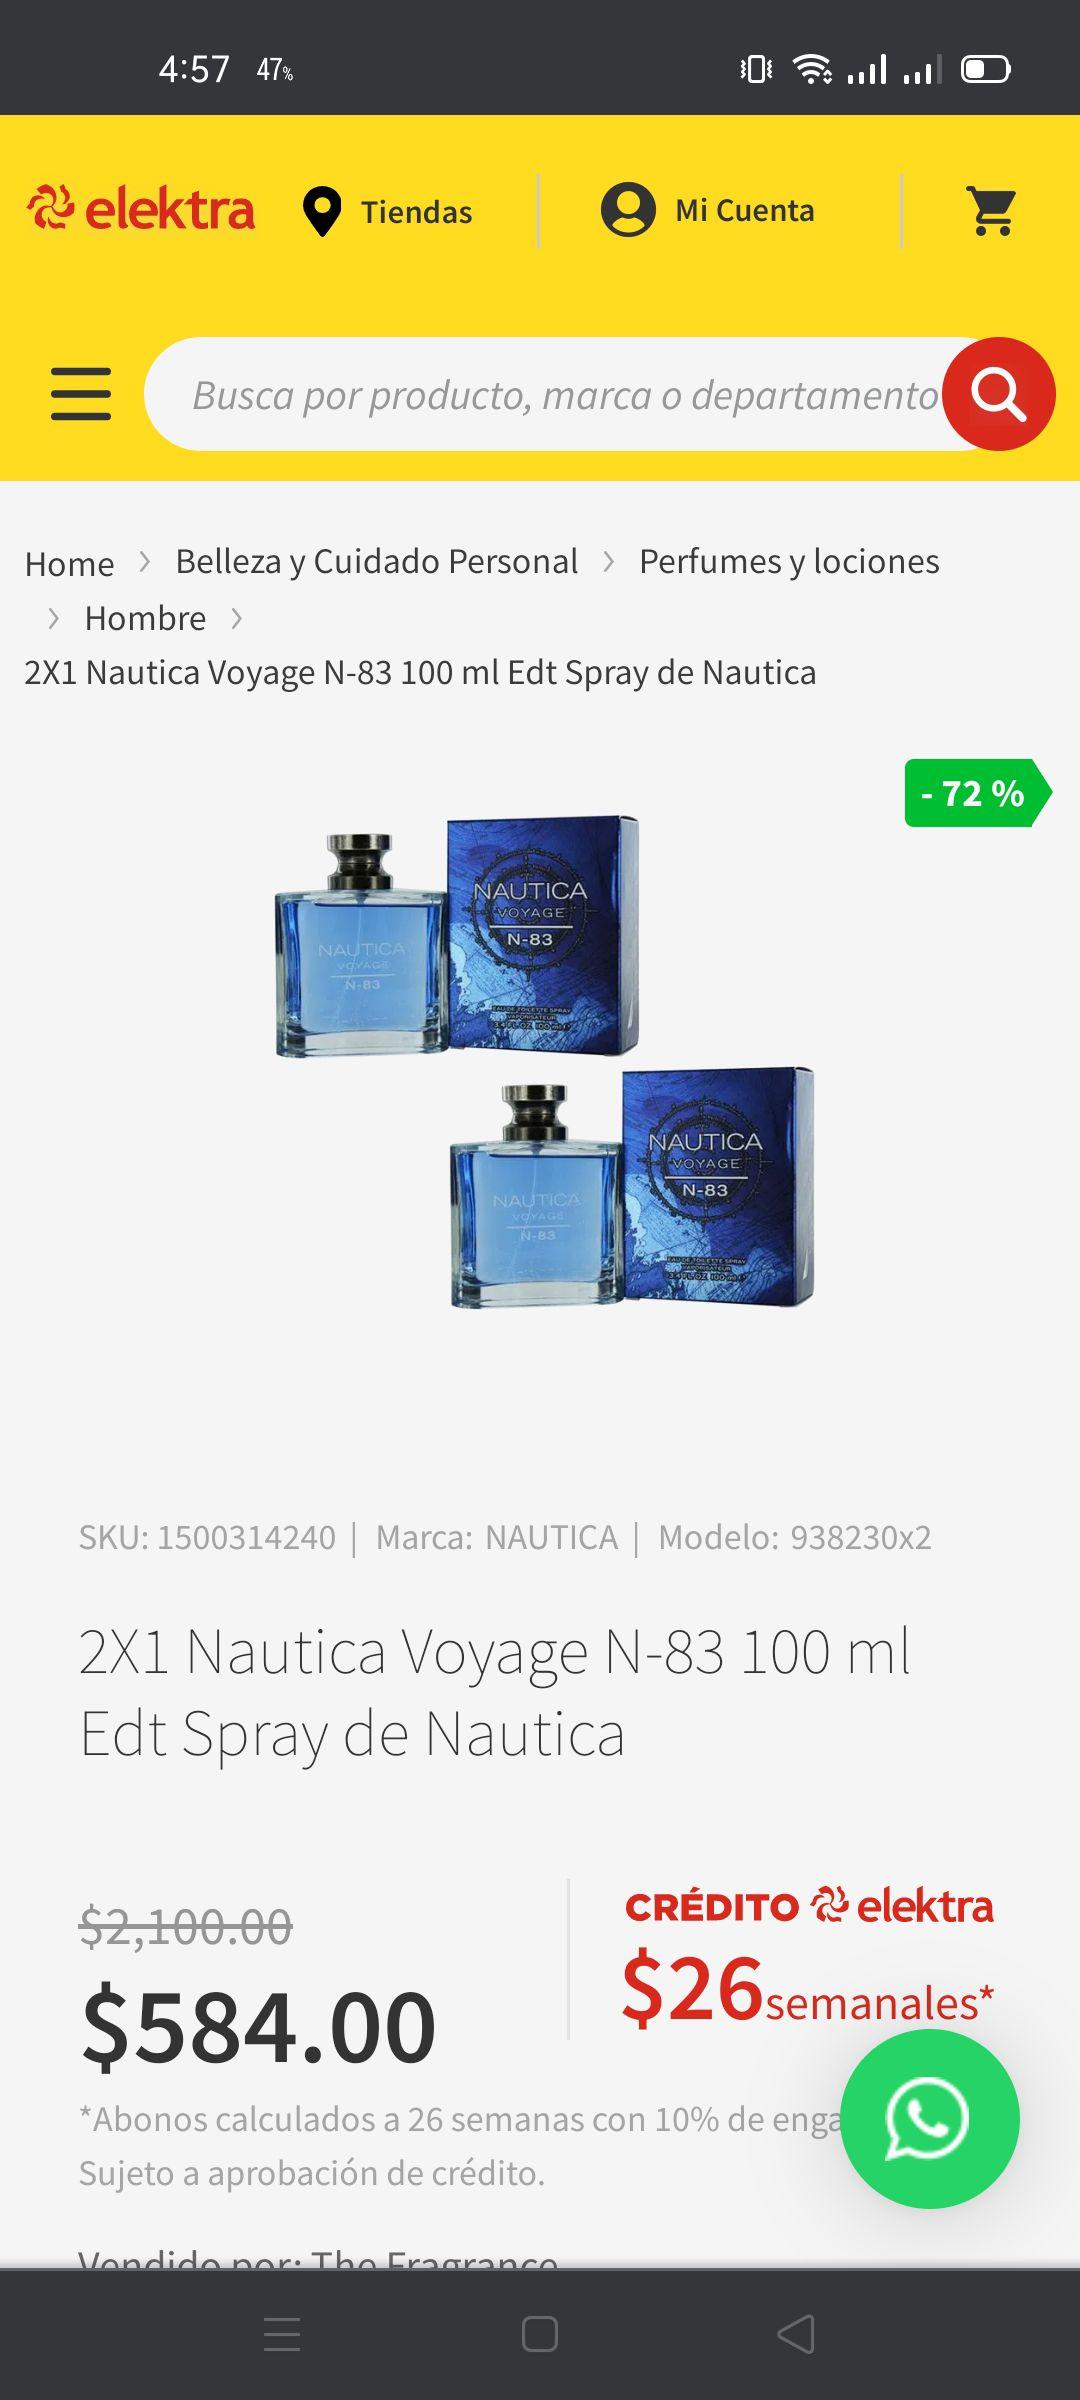 Elektra: Perfume 2X1 Nautica Voyage N-83 100 ml Edt Spray de Nautica